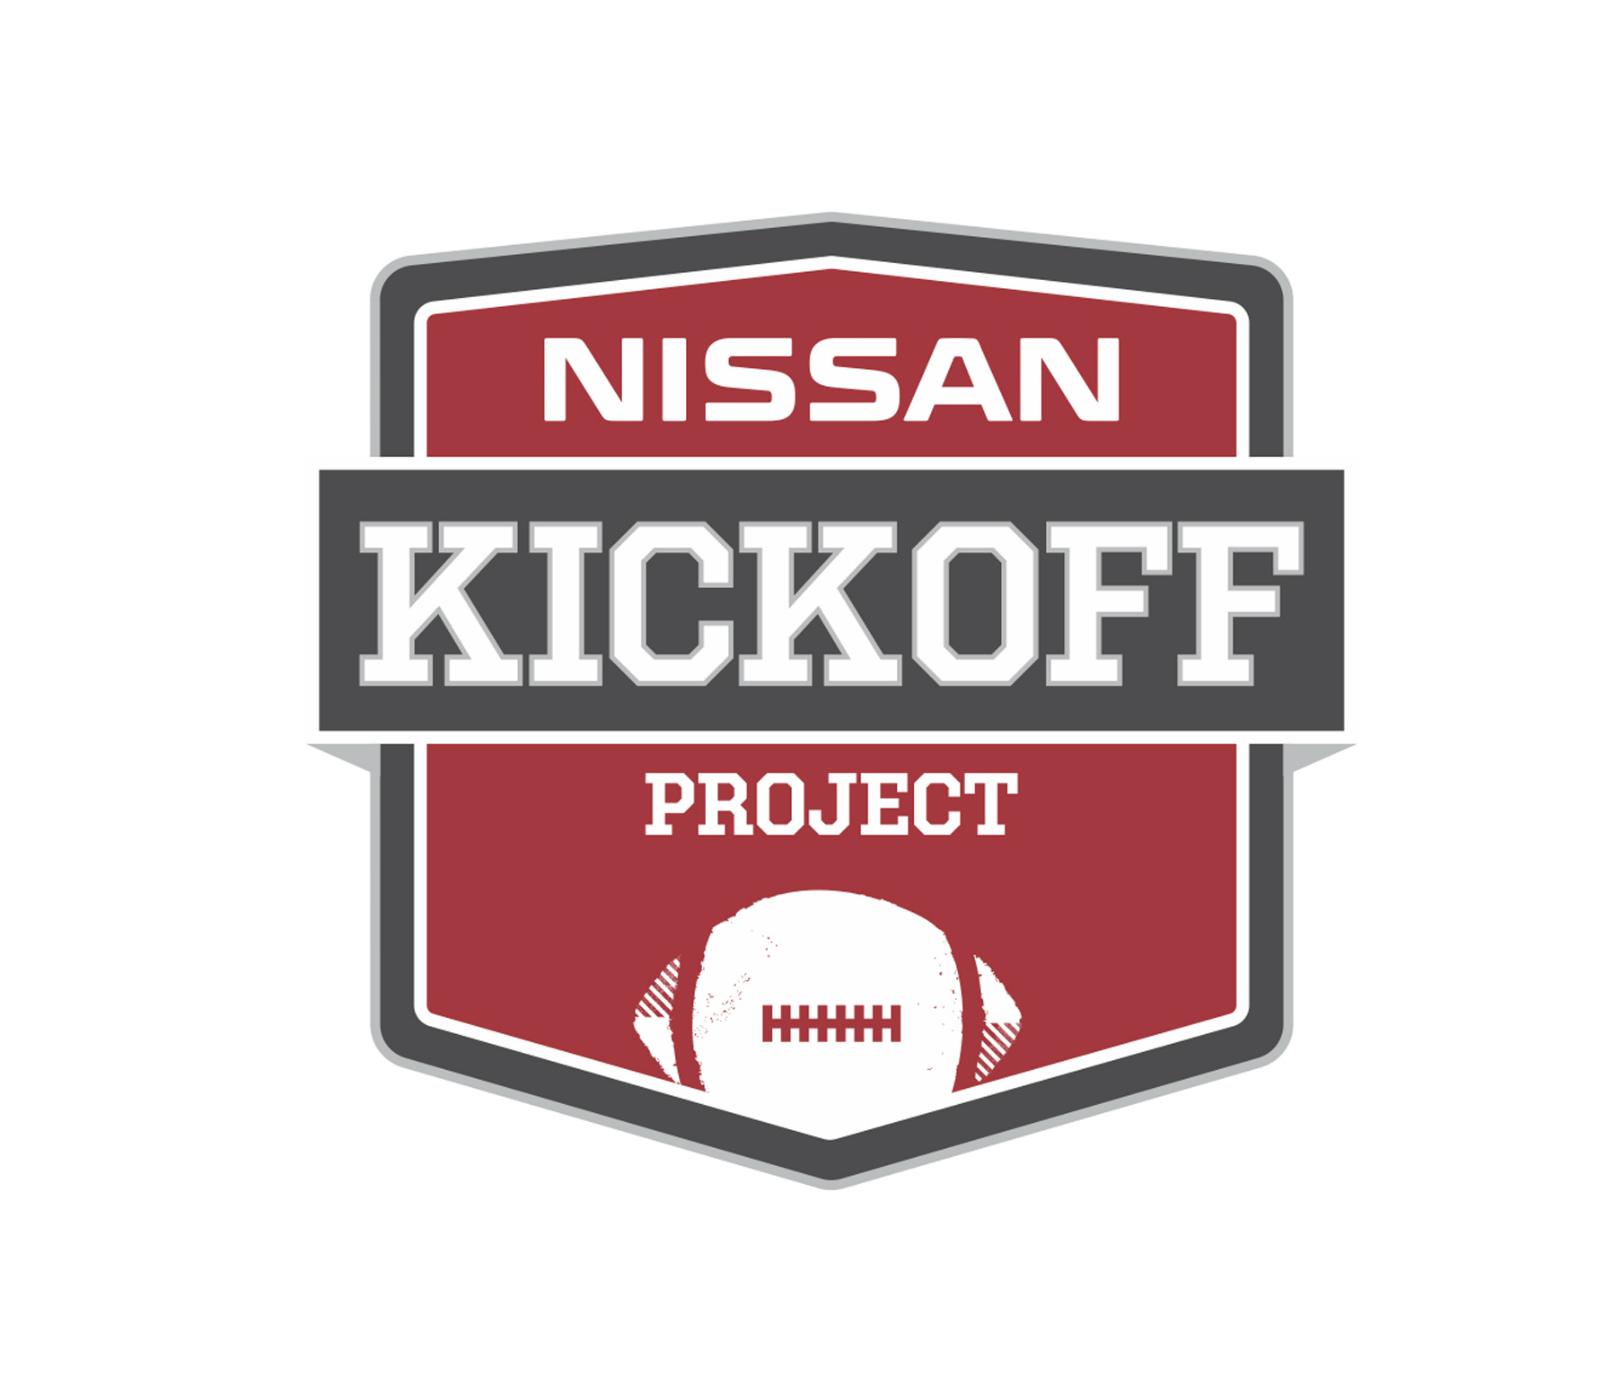 Nissan Kickoff Project